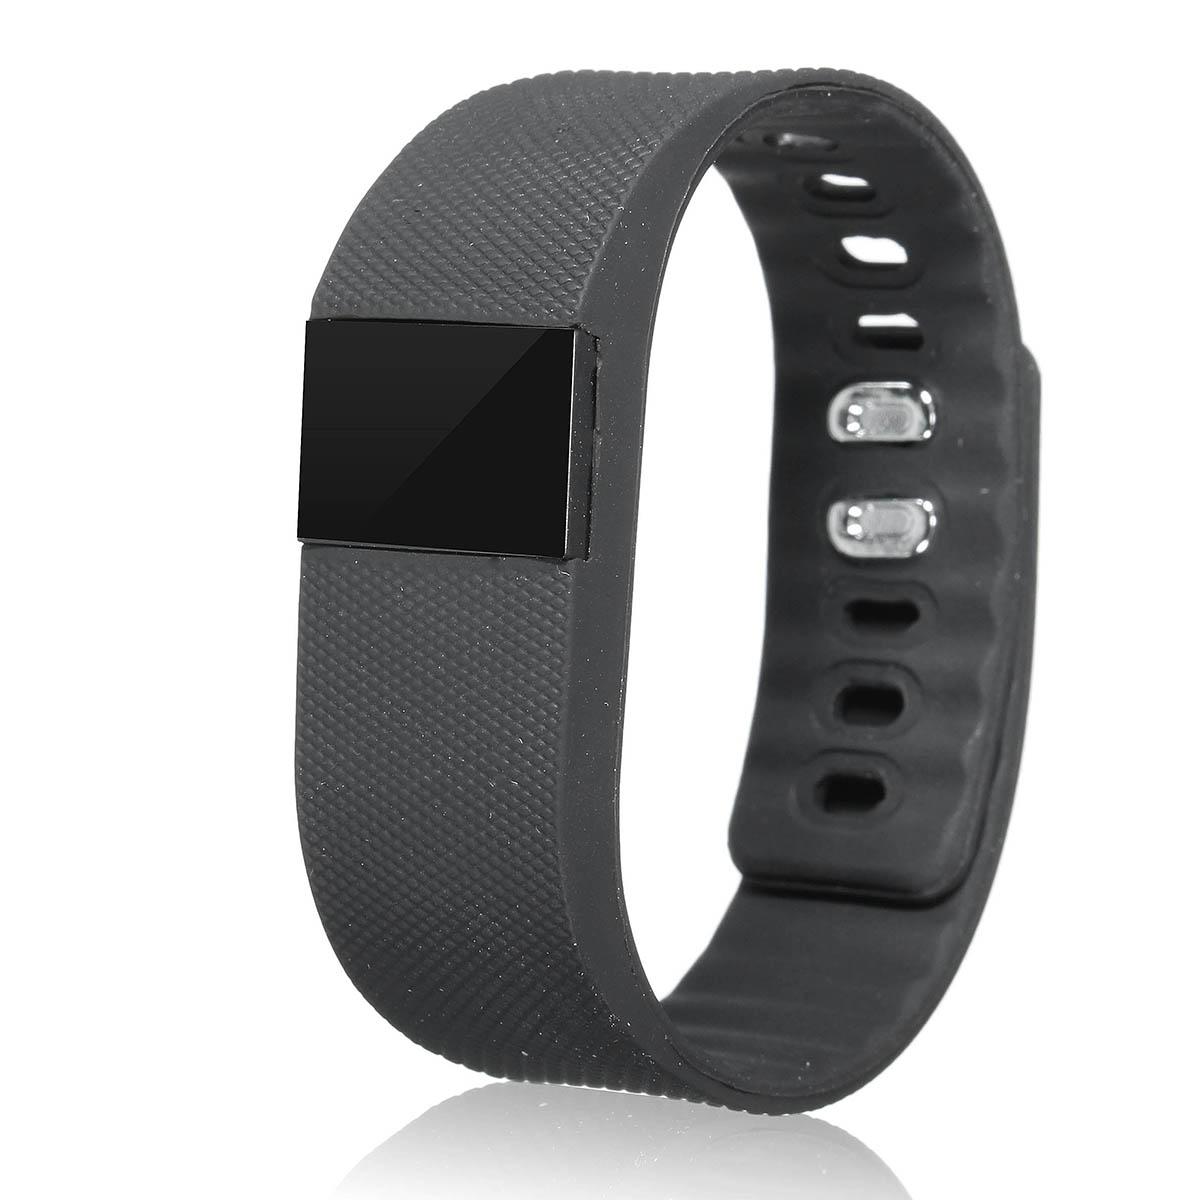 TW64 Bluetooth Pedometer Smart Wrist Watch Bracelet For ...